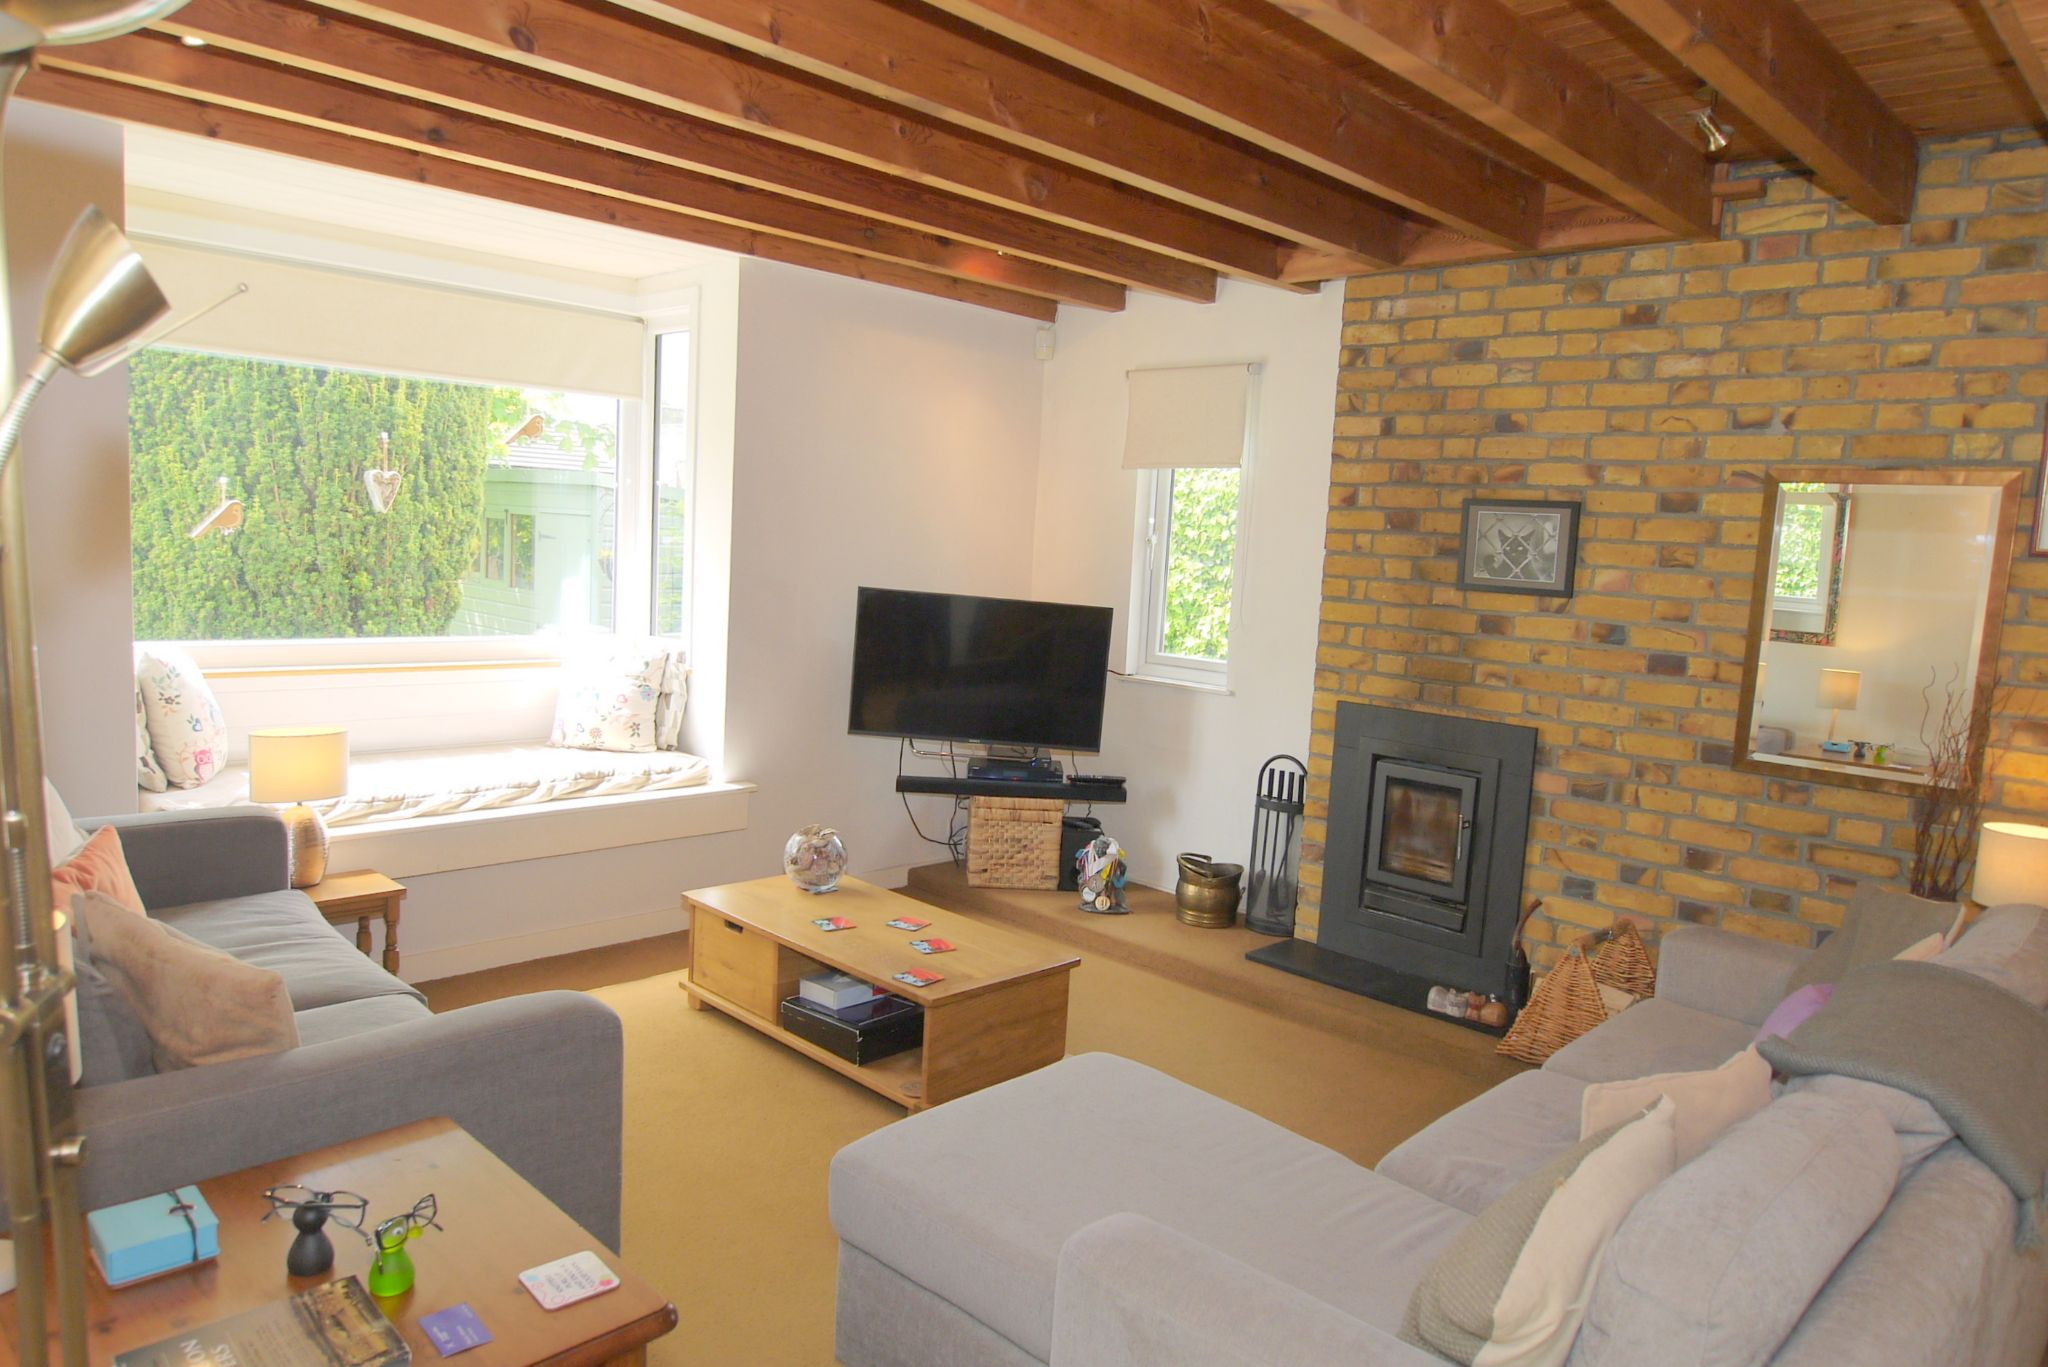 3 bedroom semi-detached house Sold in Sevenoaks - Photograph 10